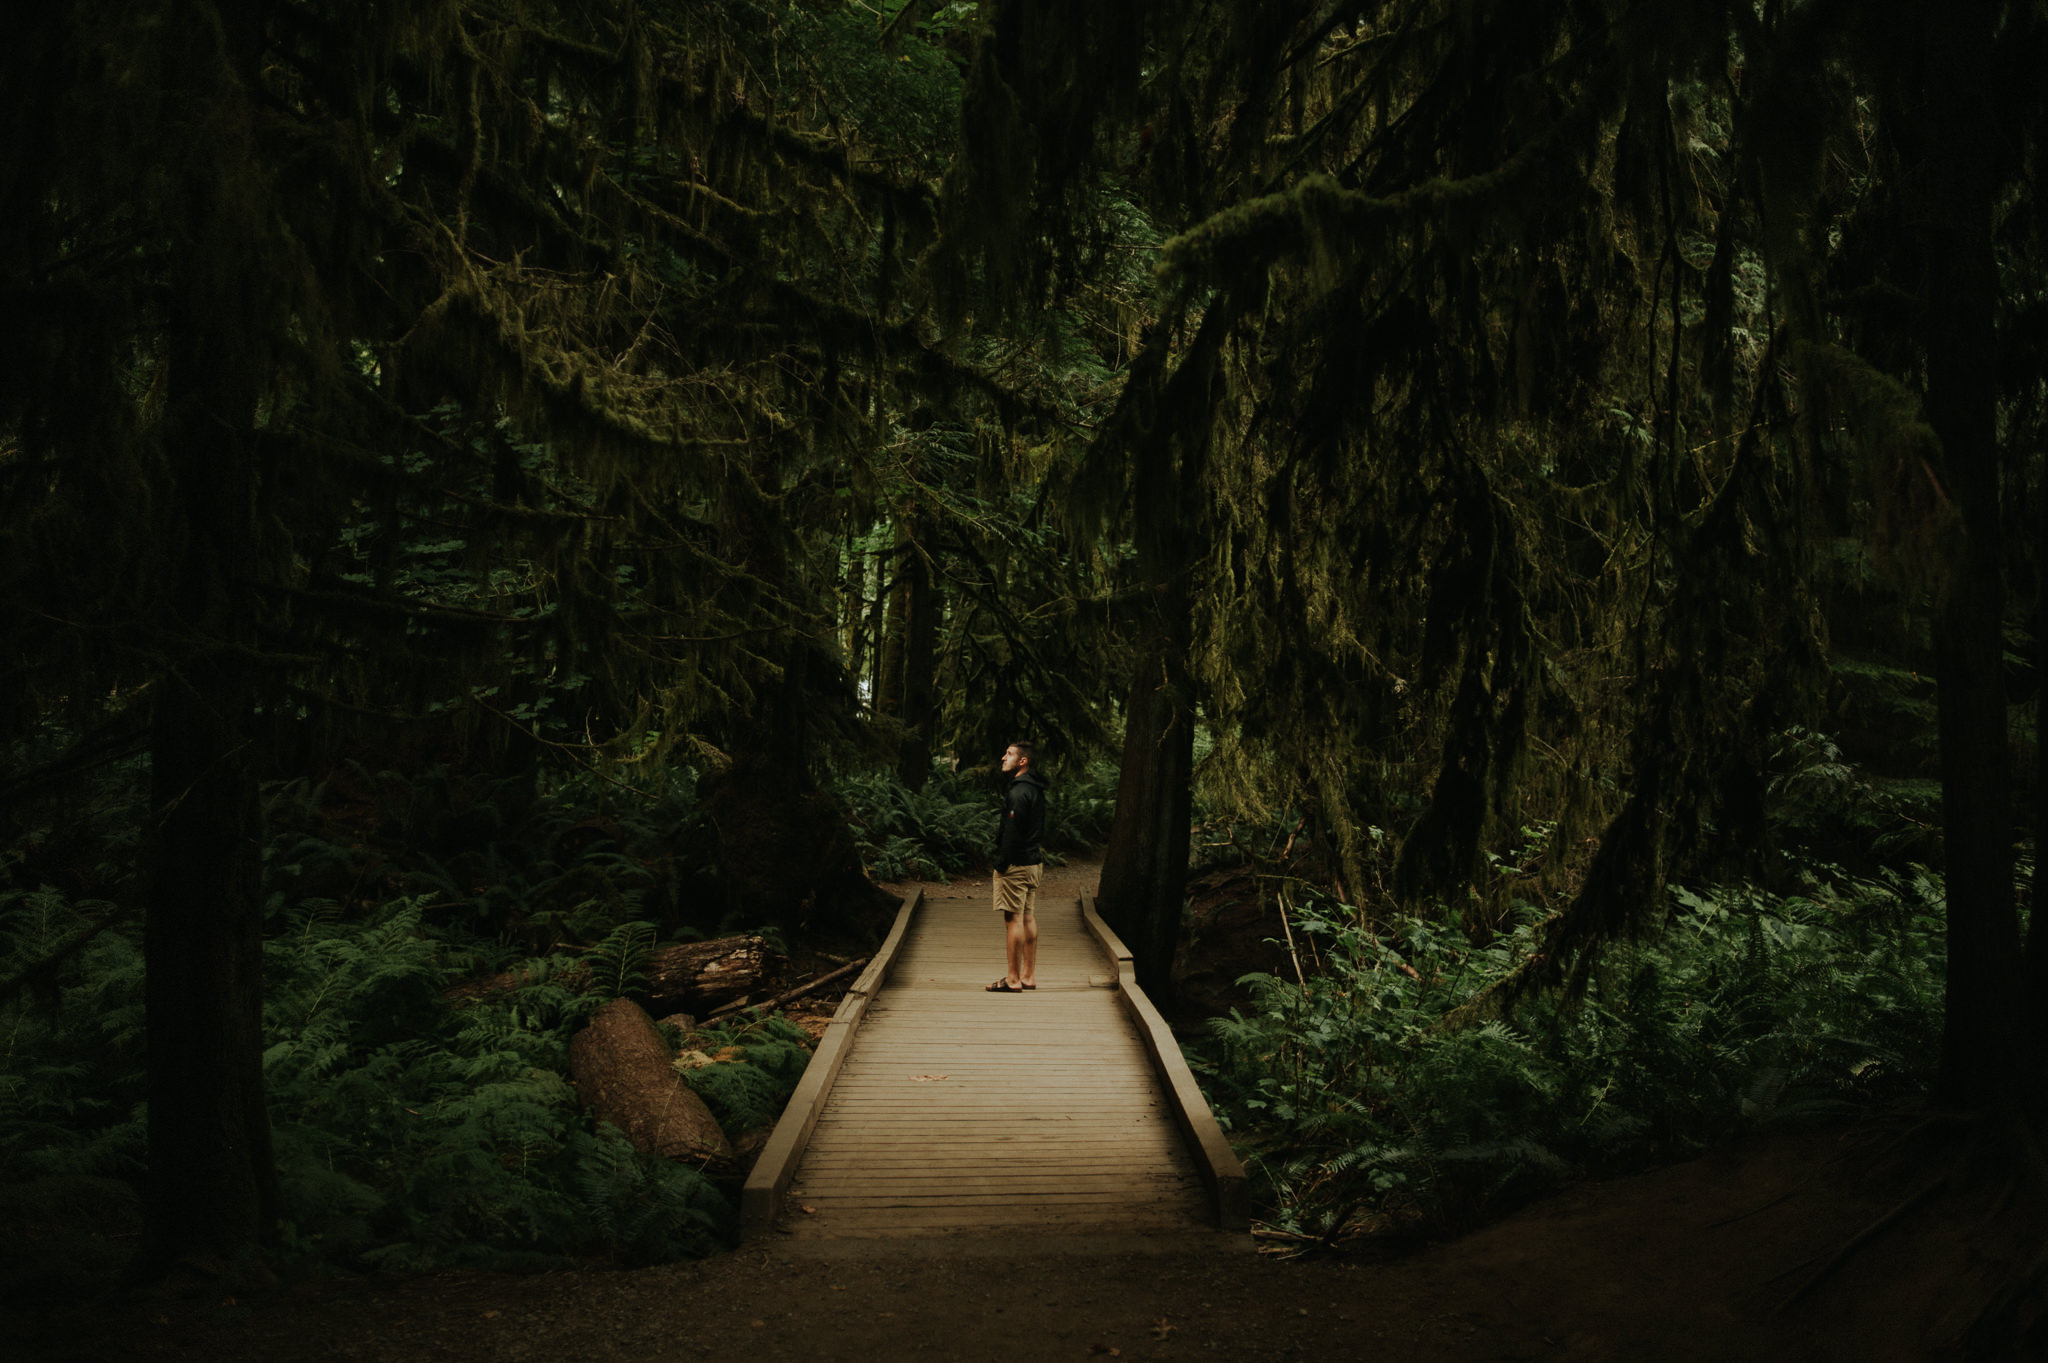 Cathedral Grove, Tofino // Daring Wanderer: www.daringwanderer.com